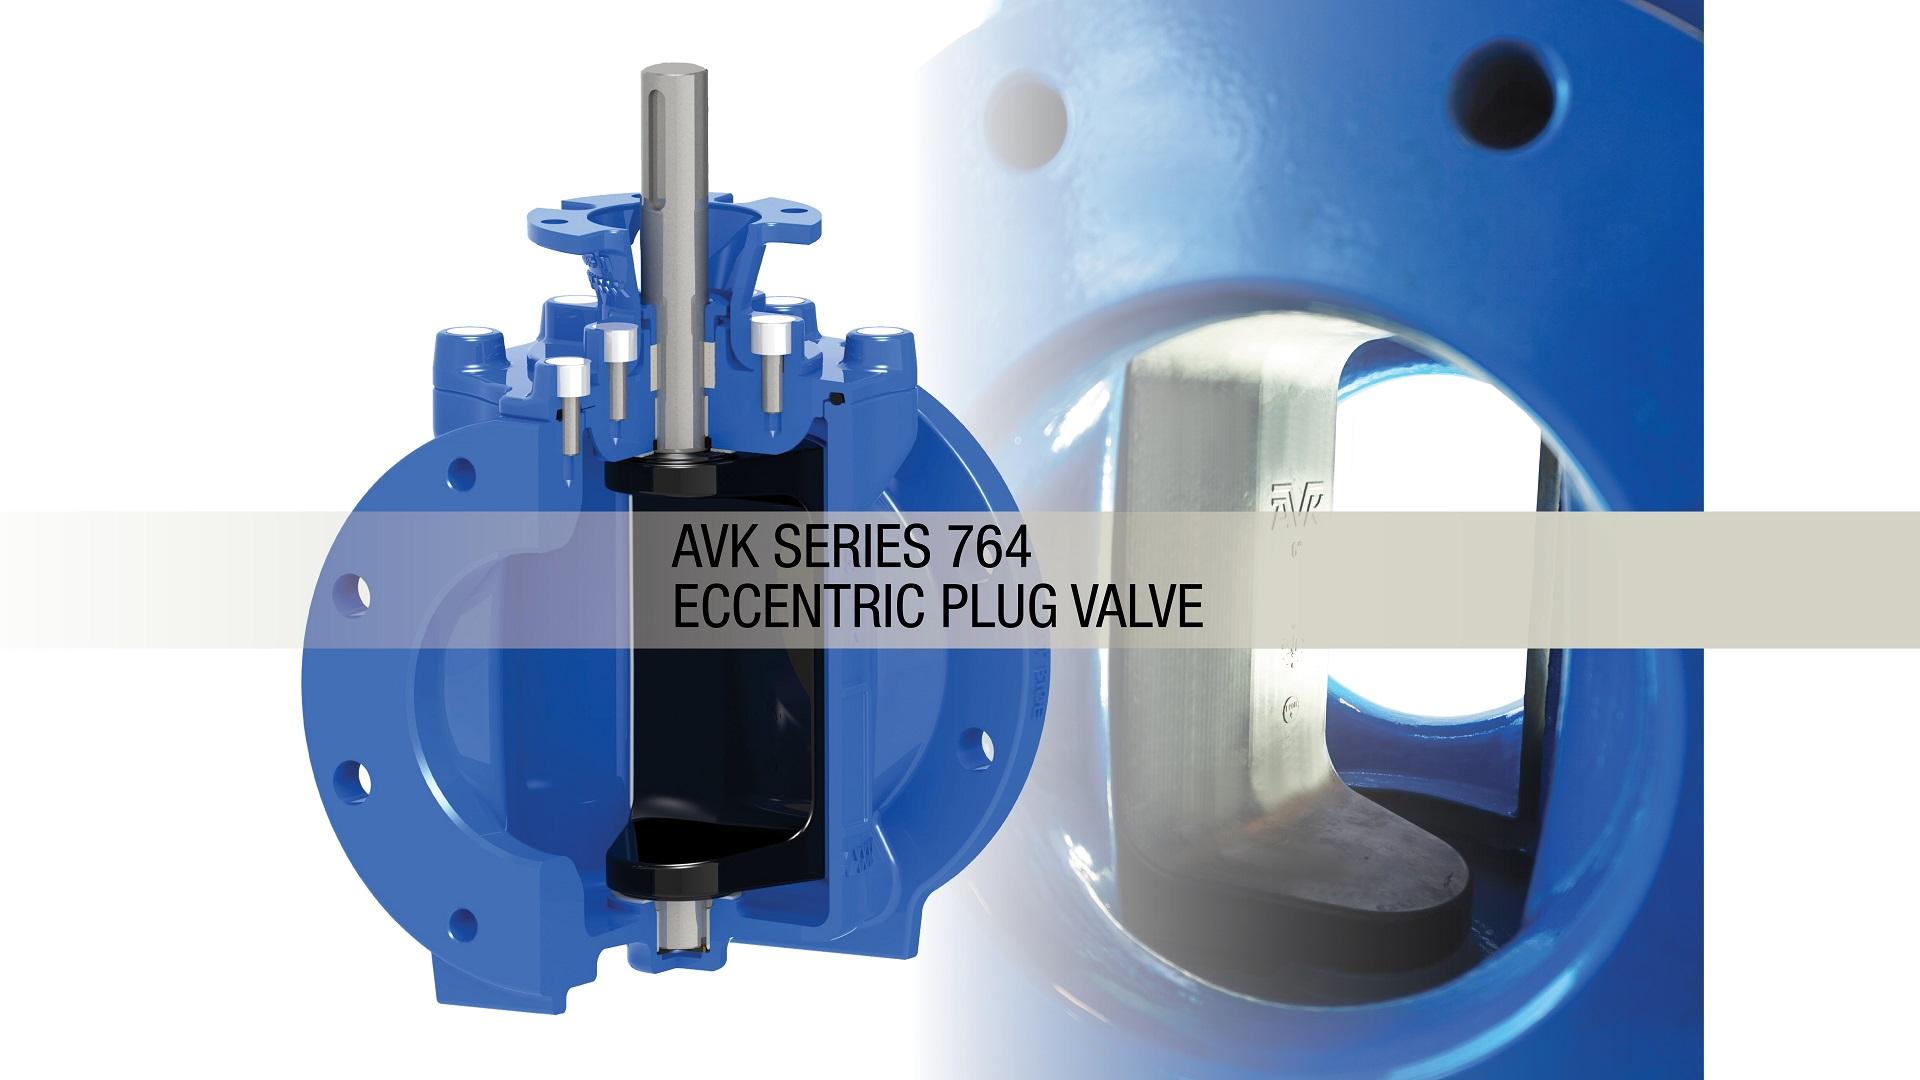 AVK Series 764 Eccentric Plug Valves